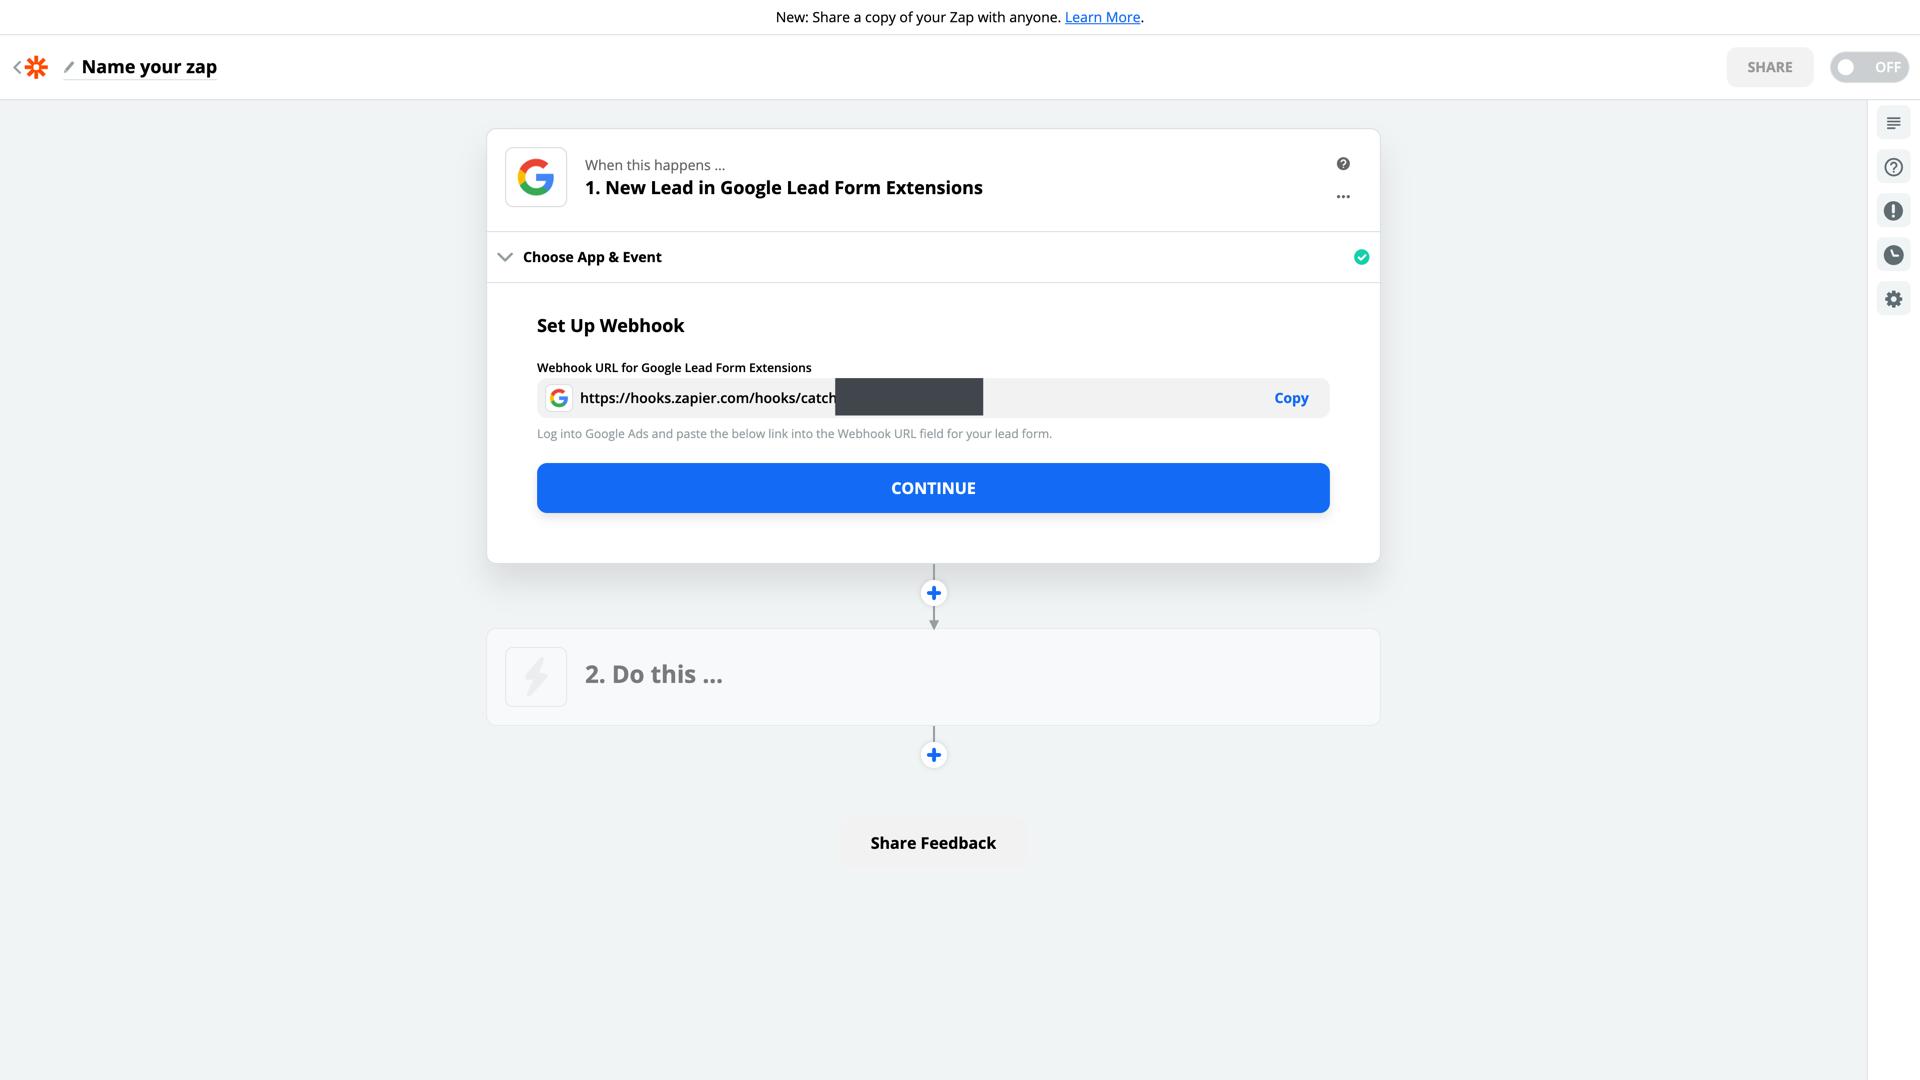 Google Lead Form Extension Webhook URL